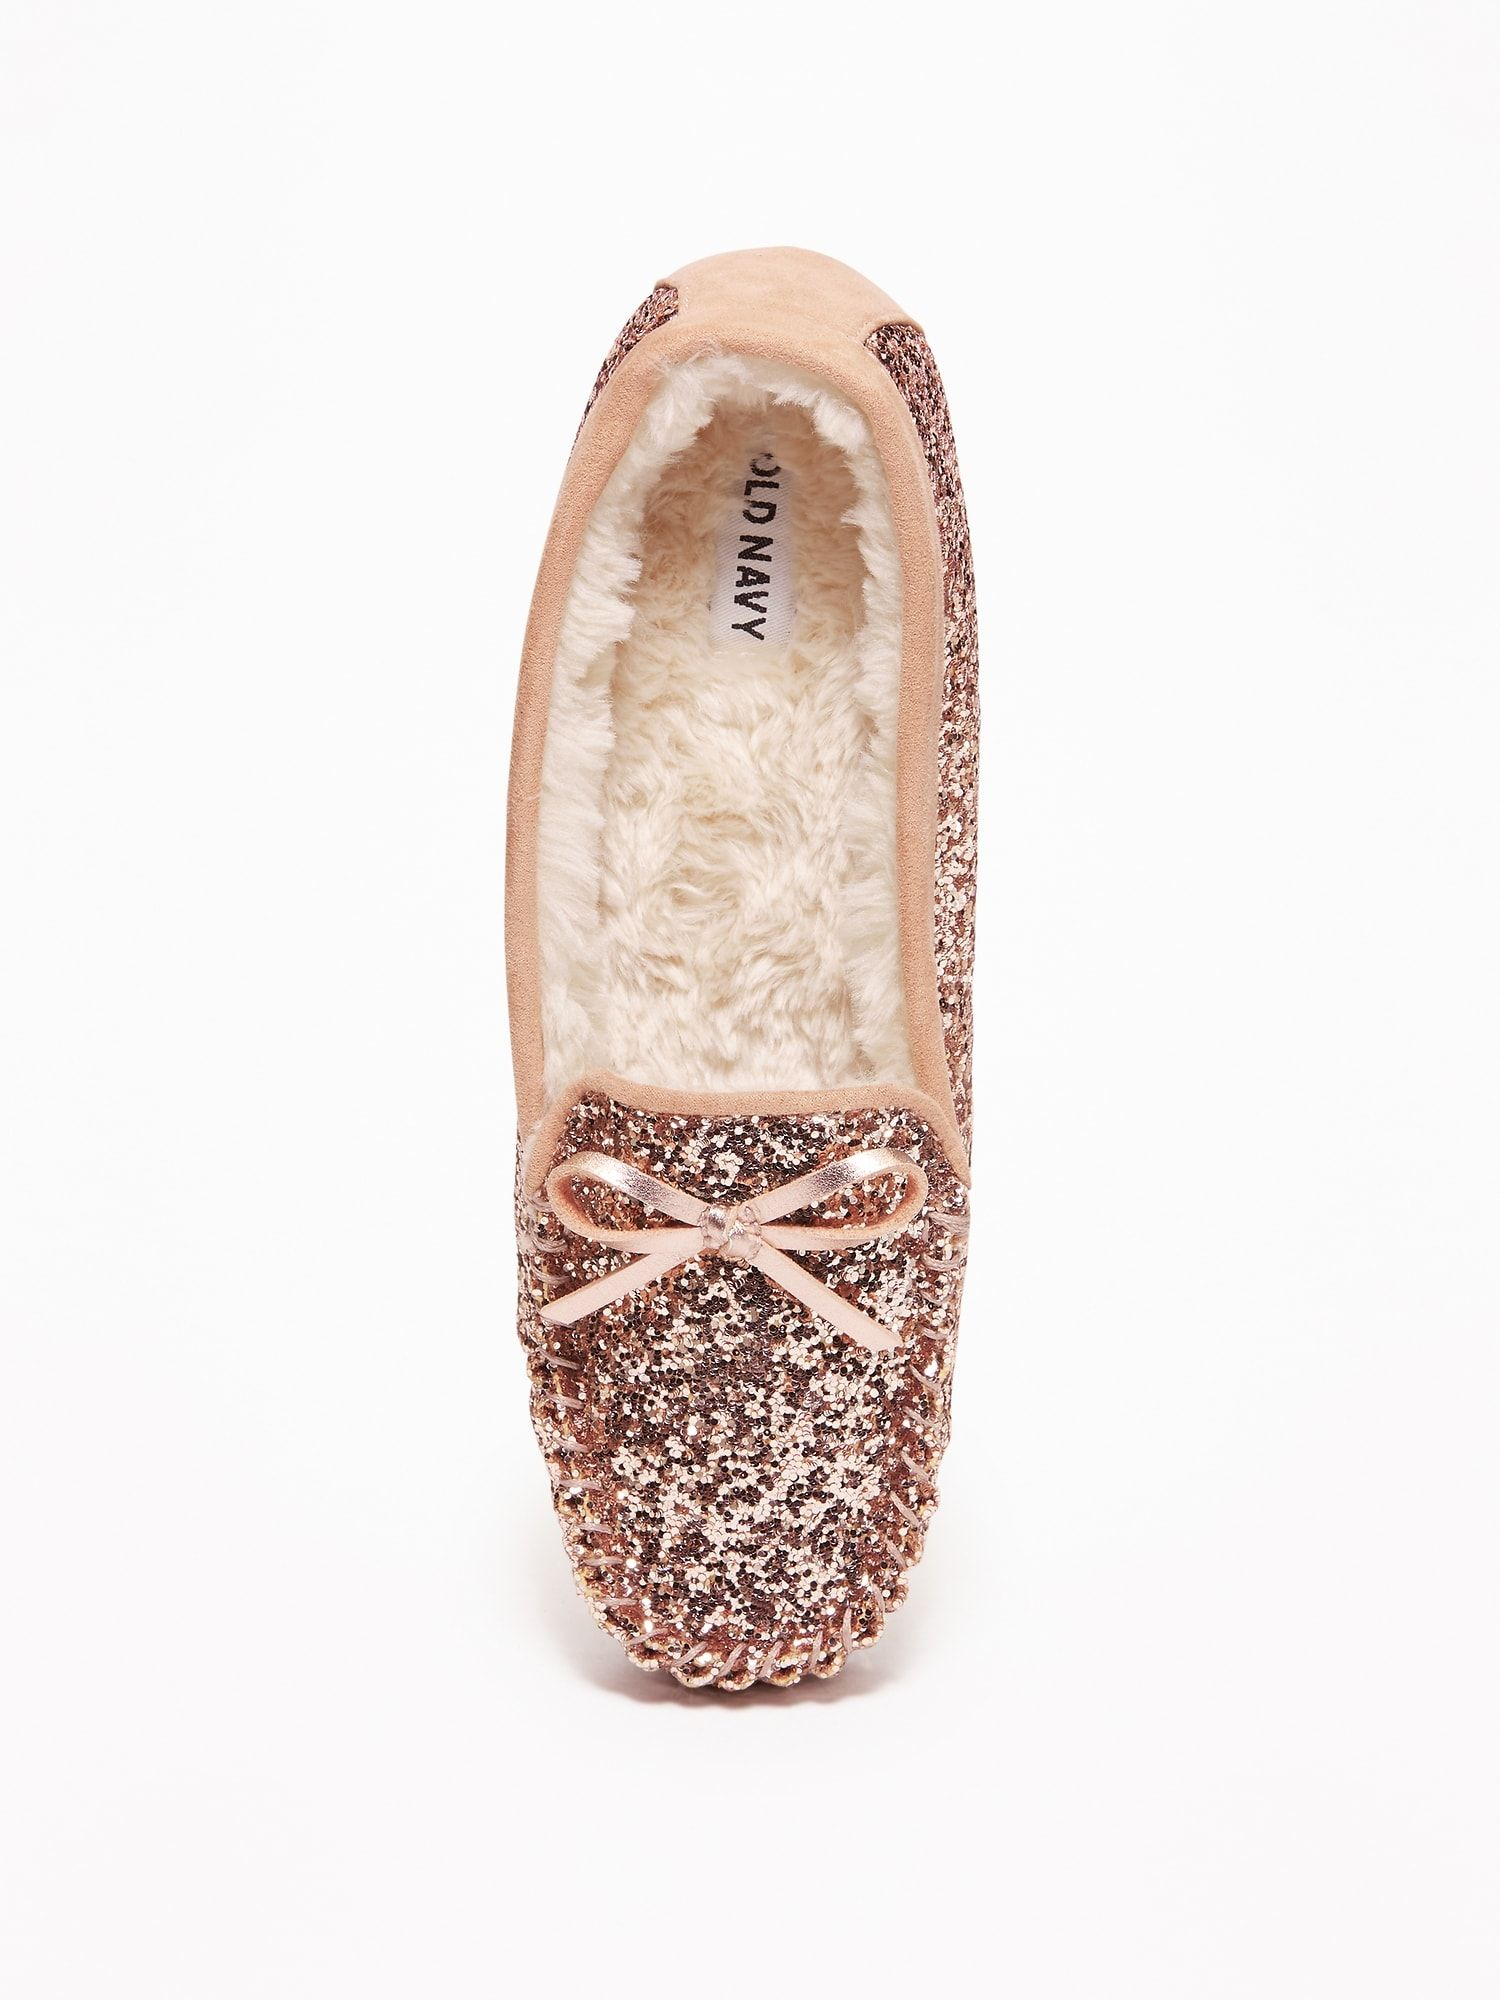 b8c1c5c46c429 Glitter Sherpa-Lined Moccasin Slippers for Women in 2019 | wishin ...